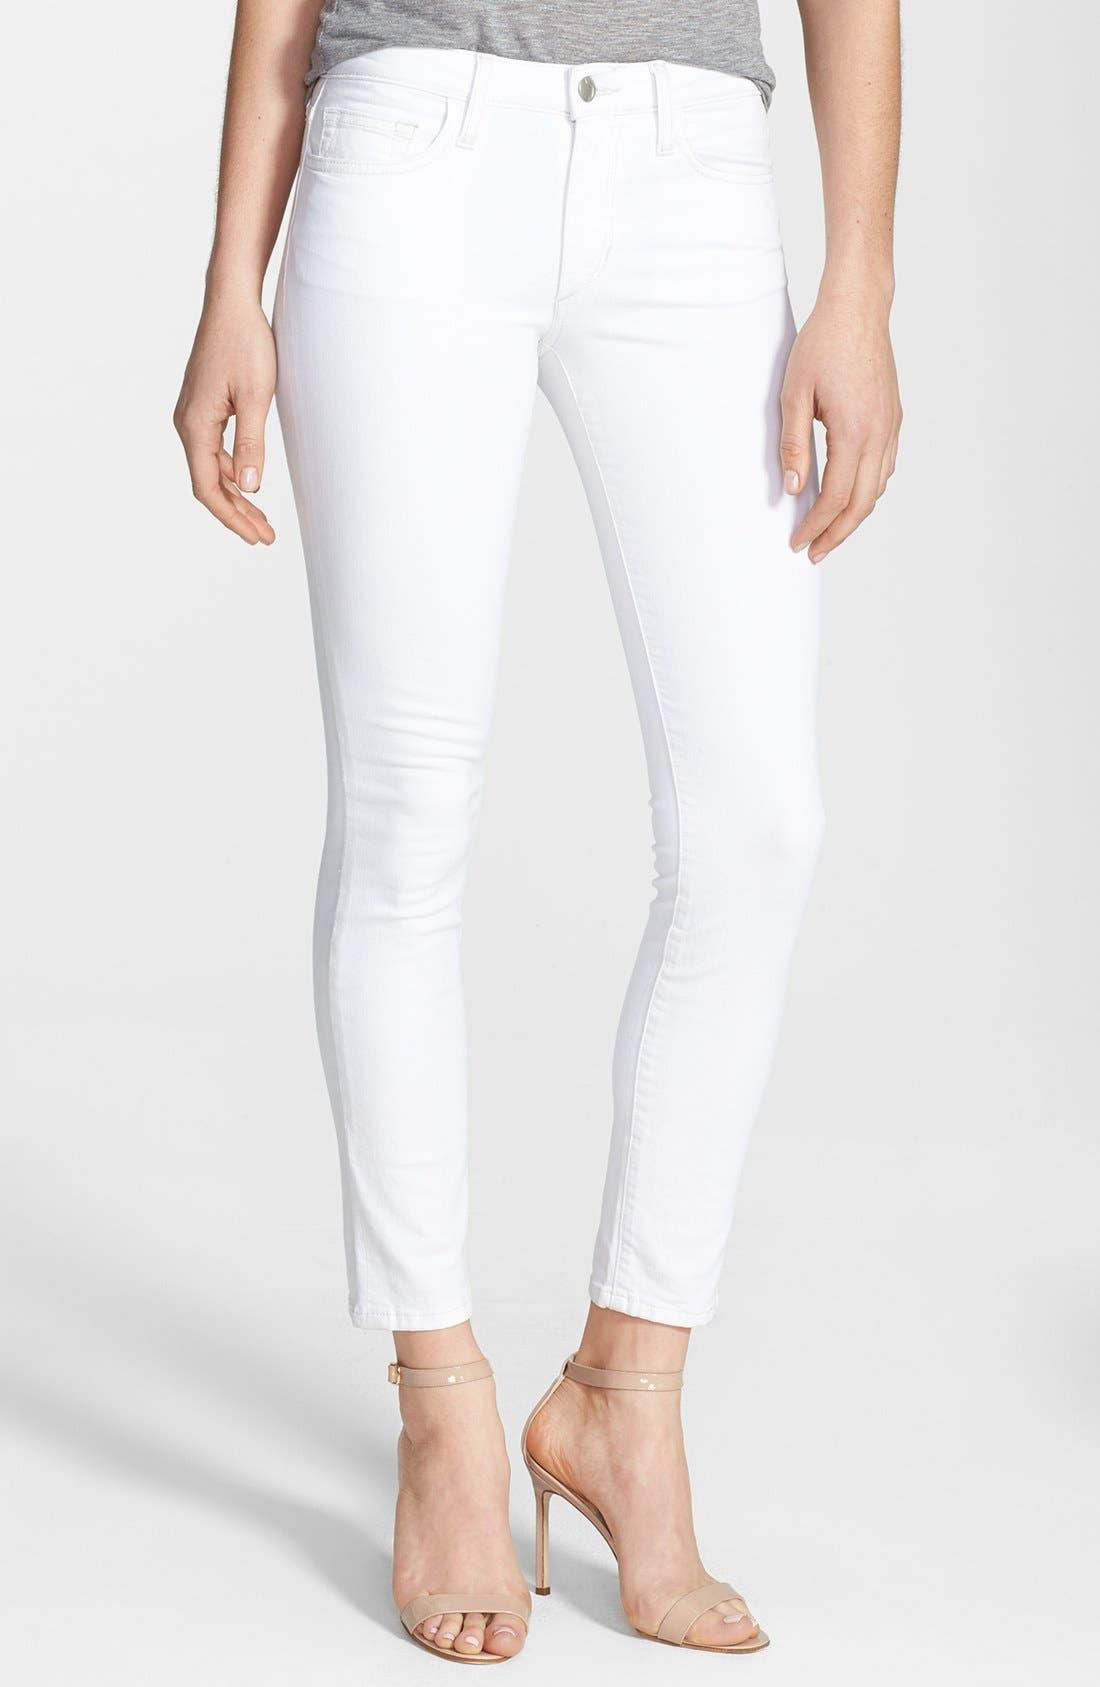 Alternate Image 1 Selected - Joe's Stretch Skinny Ankle Jeans (Pennie)